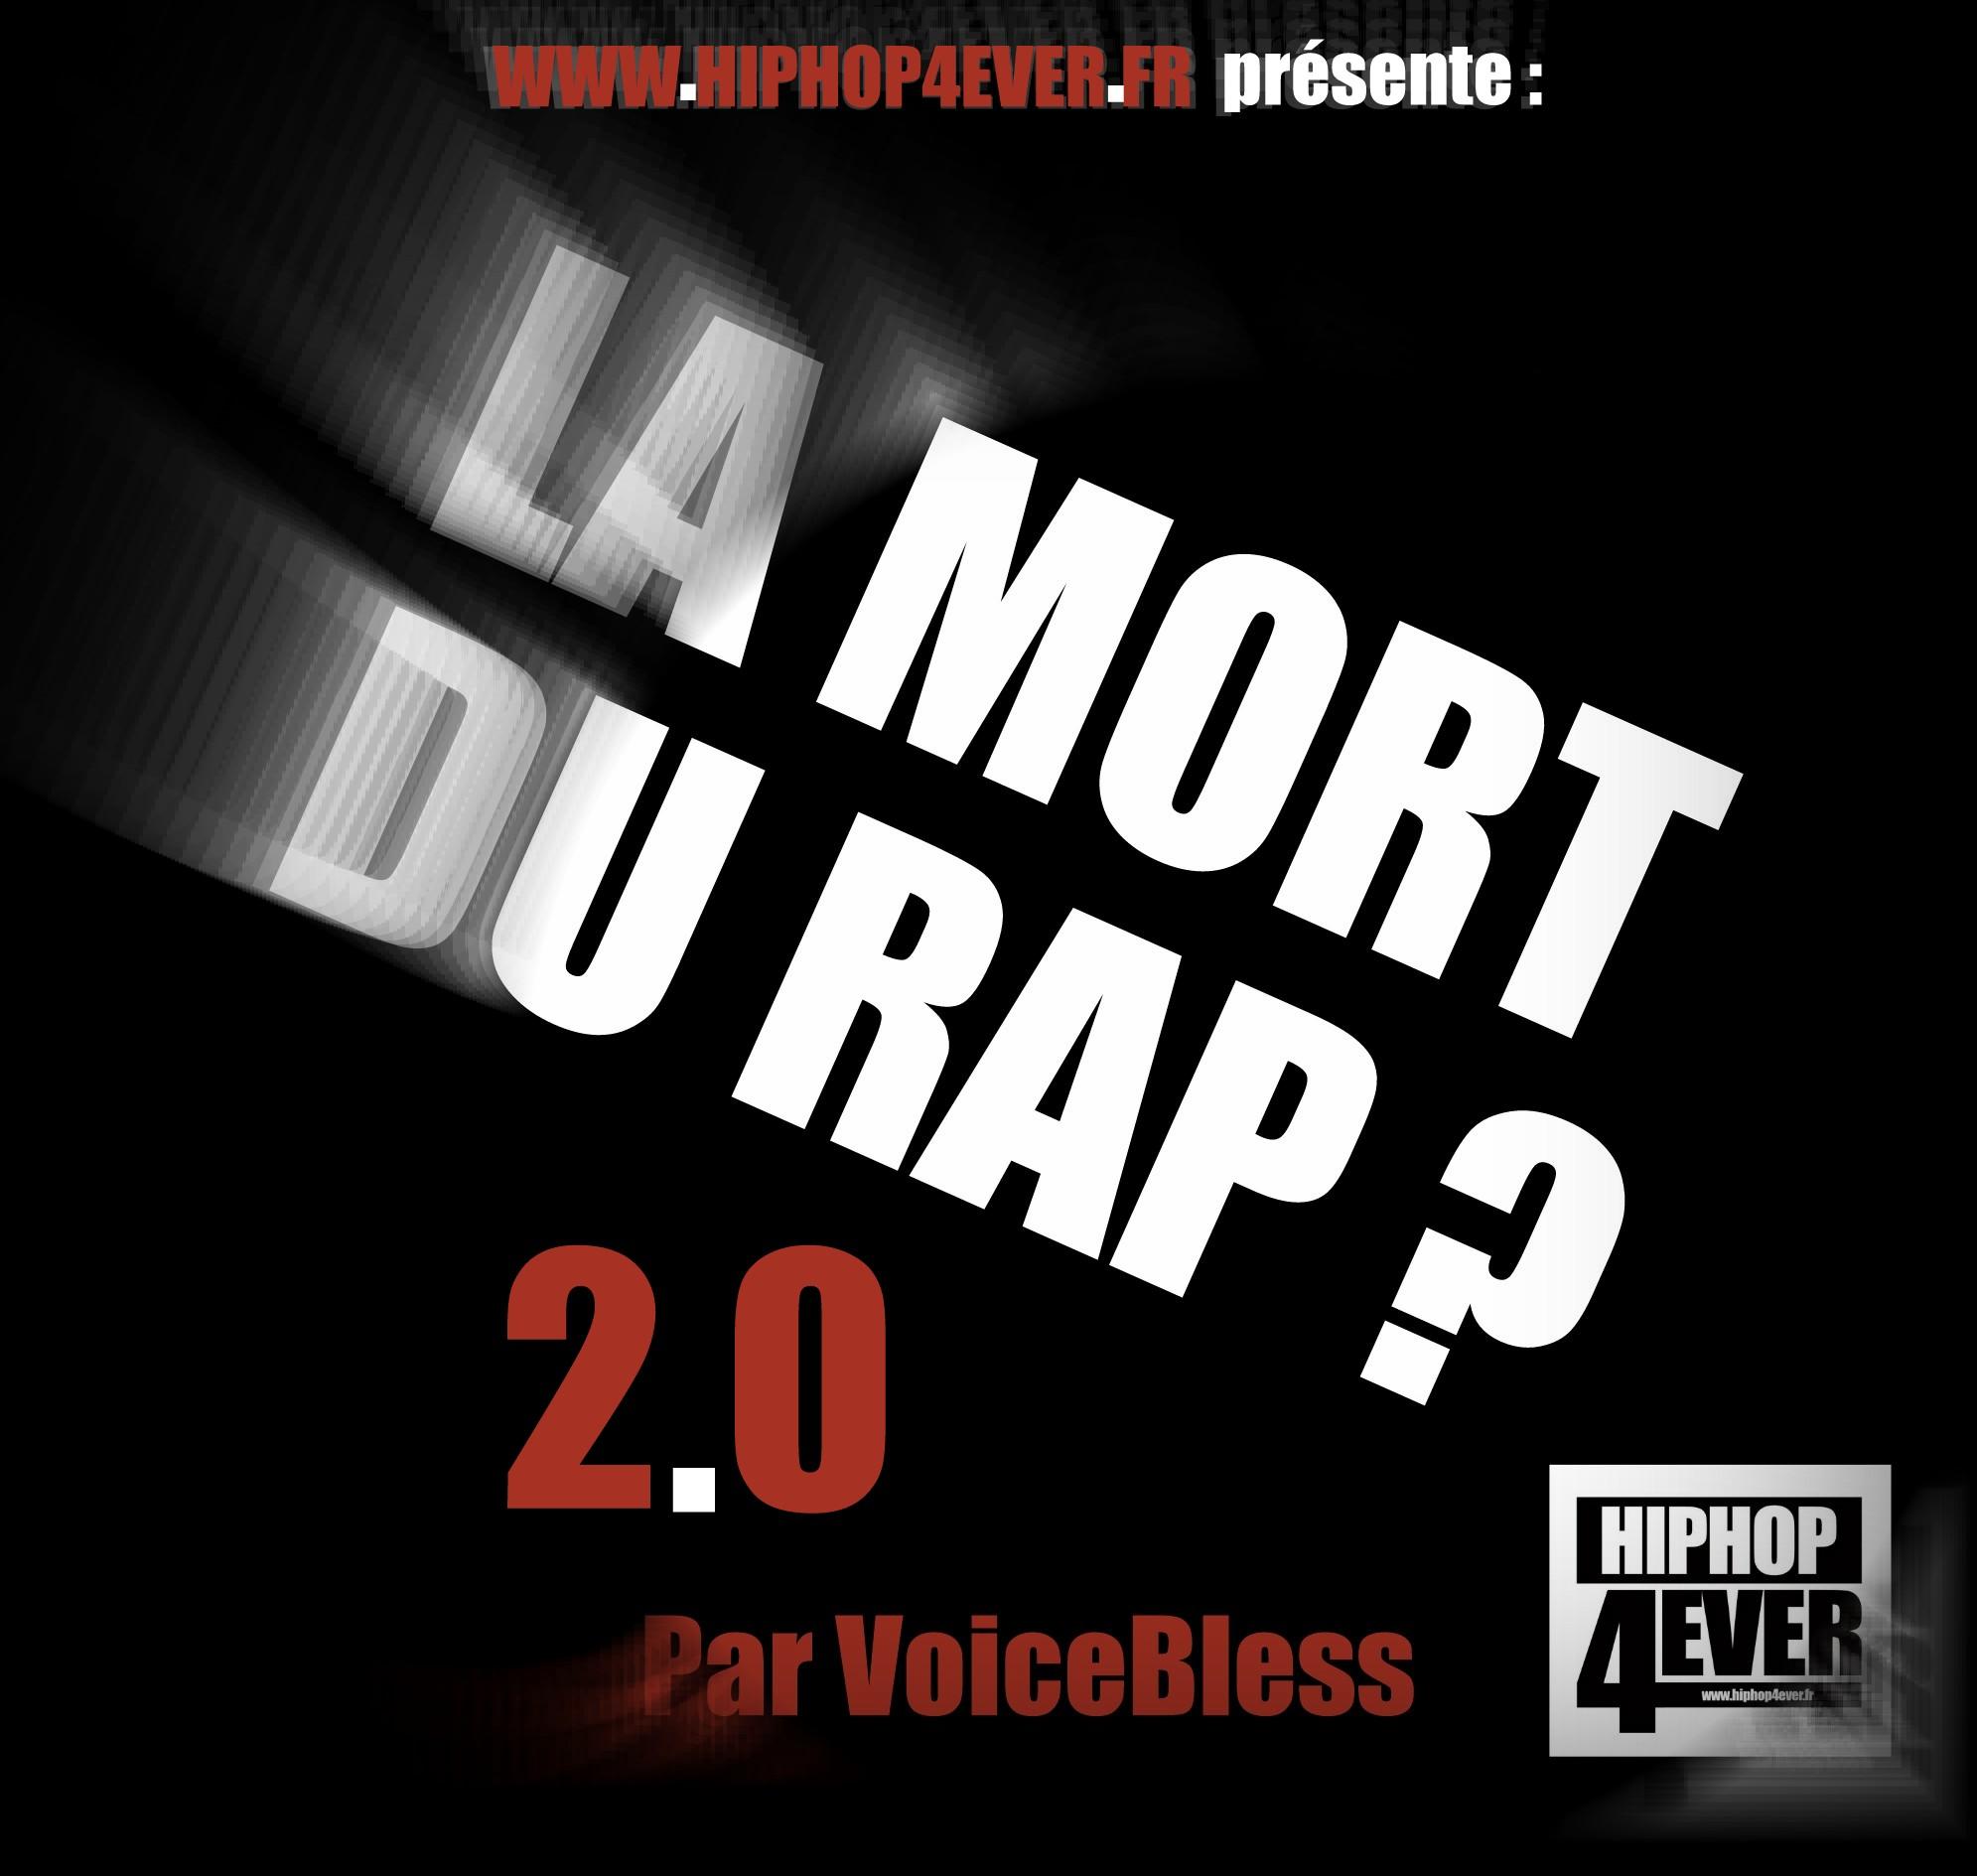 la mort du rap 2 0 OK